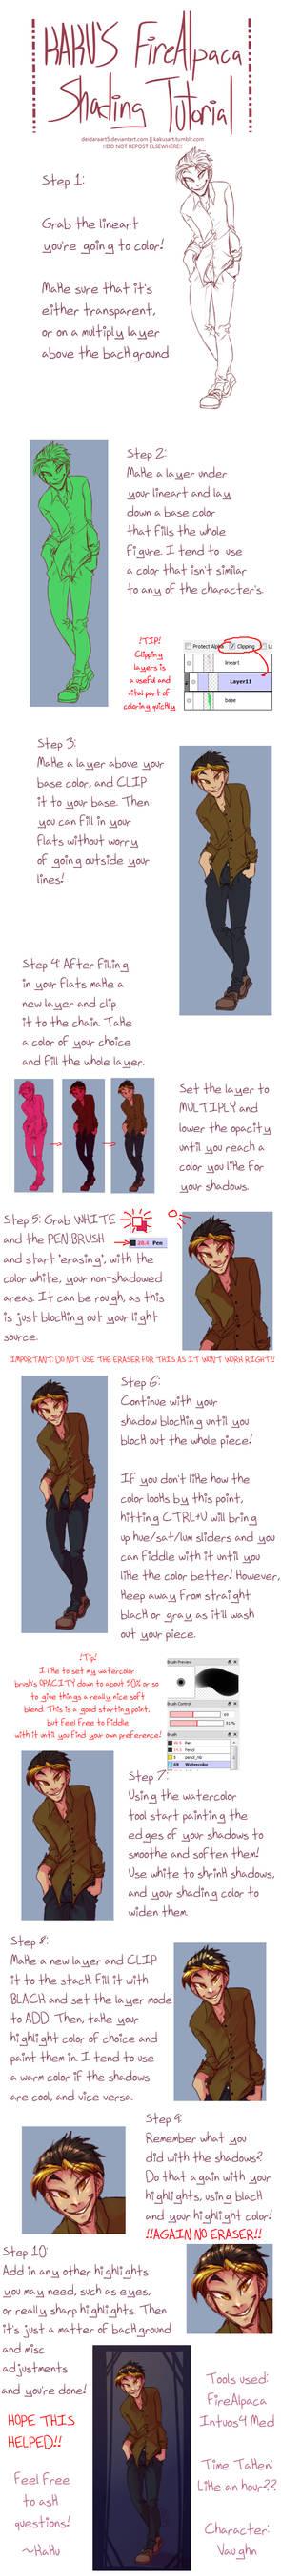 FireAlpaca Coloring Tutorial - The Kaku Way